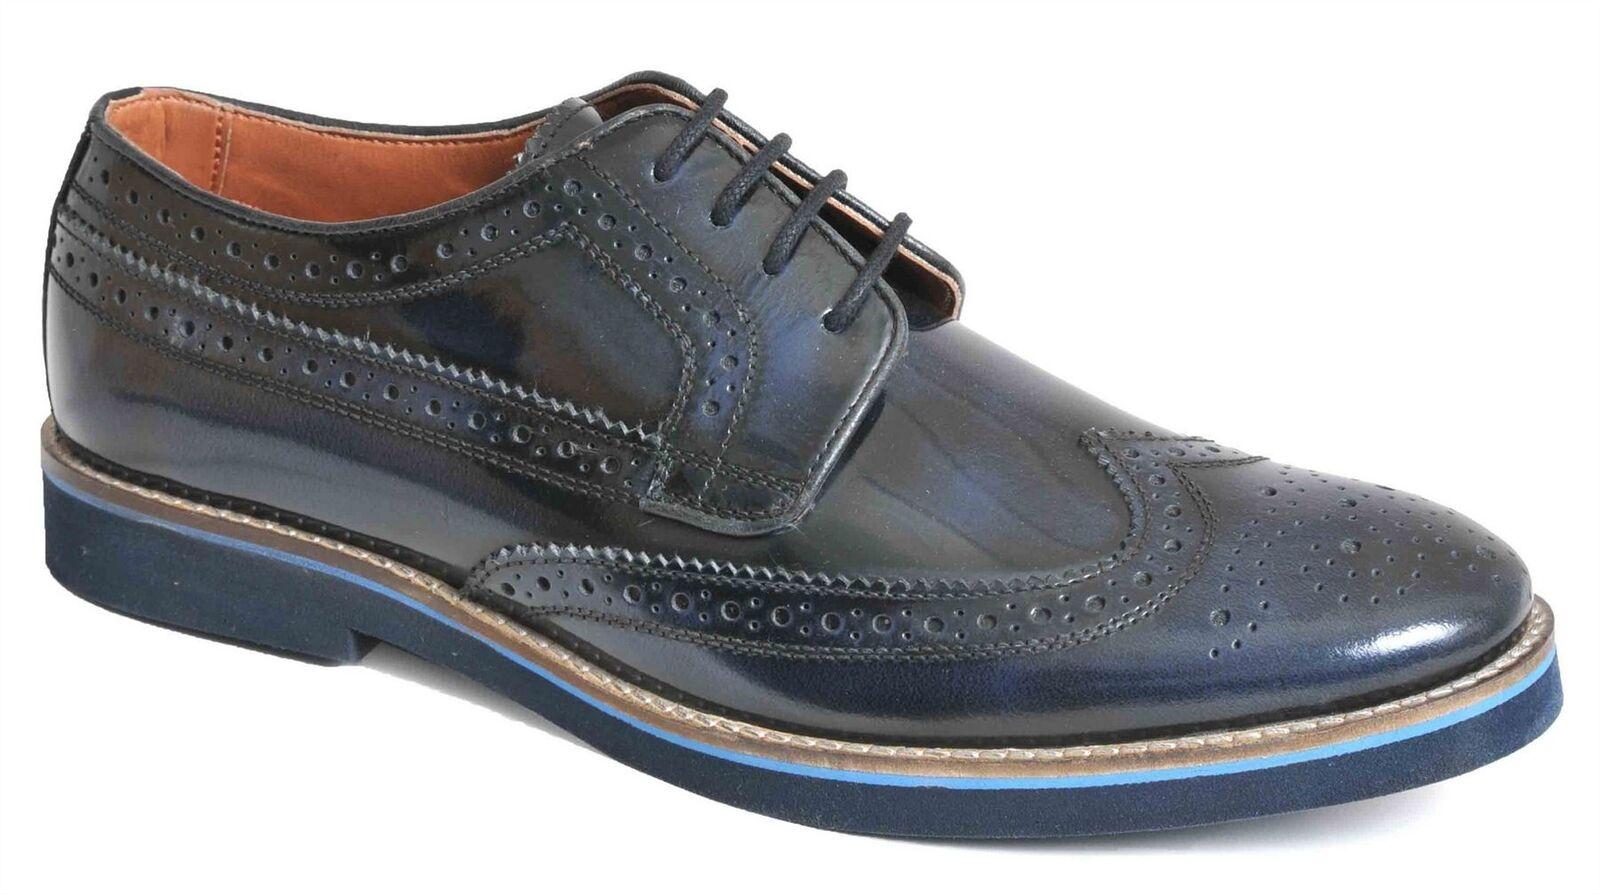 Homme Formel Chaussures En Cuir Léger à Lacets Mariage intelligent   Chaussures Taille